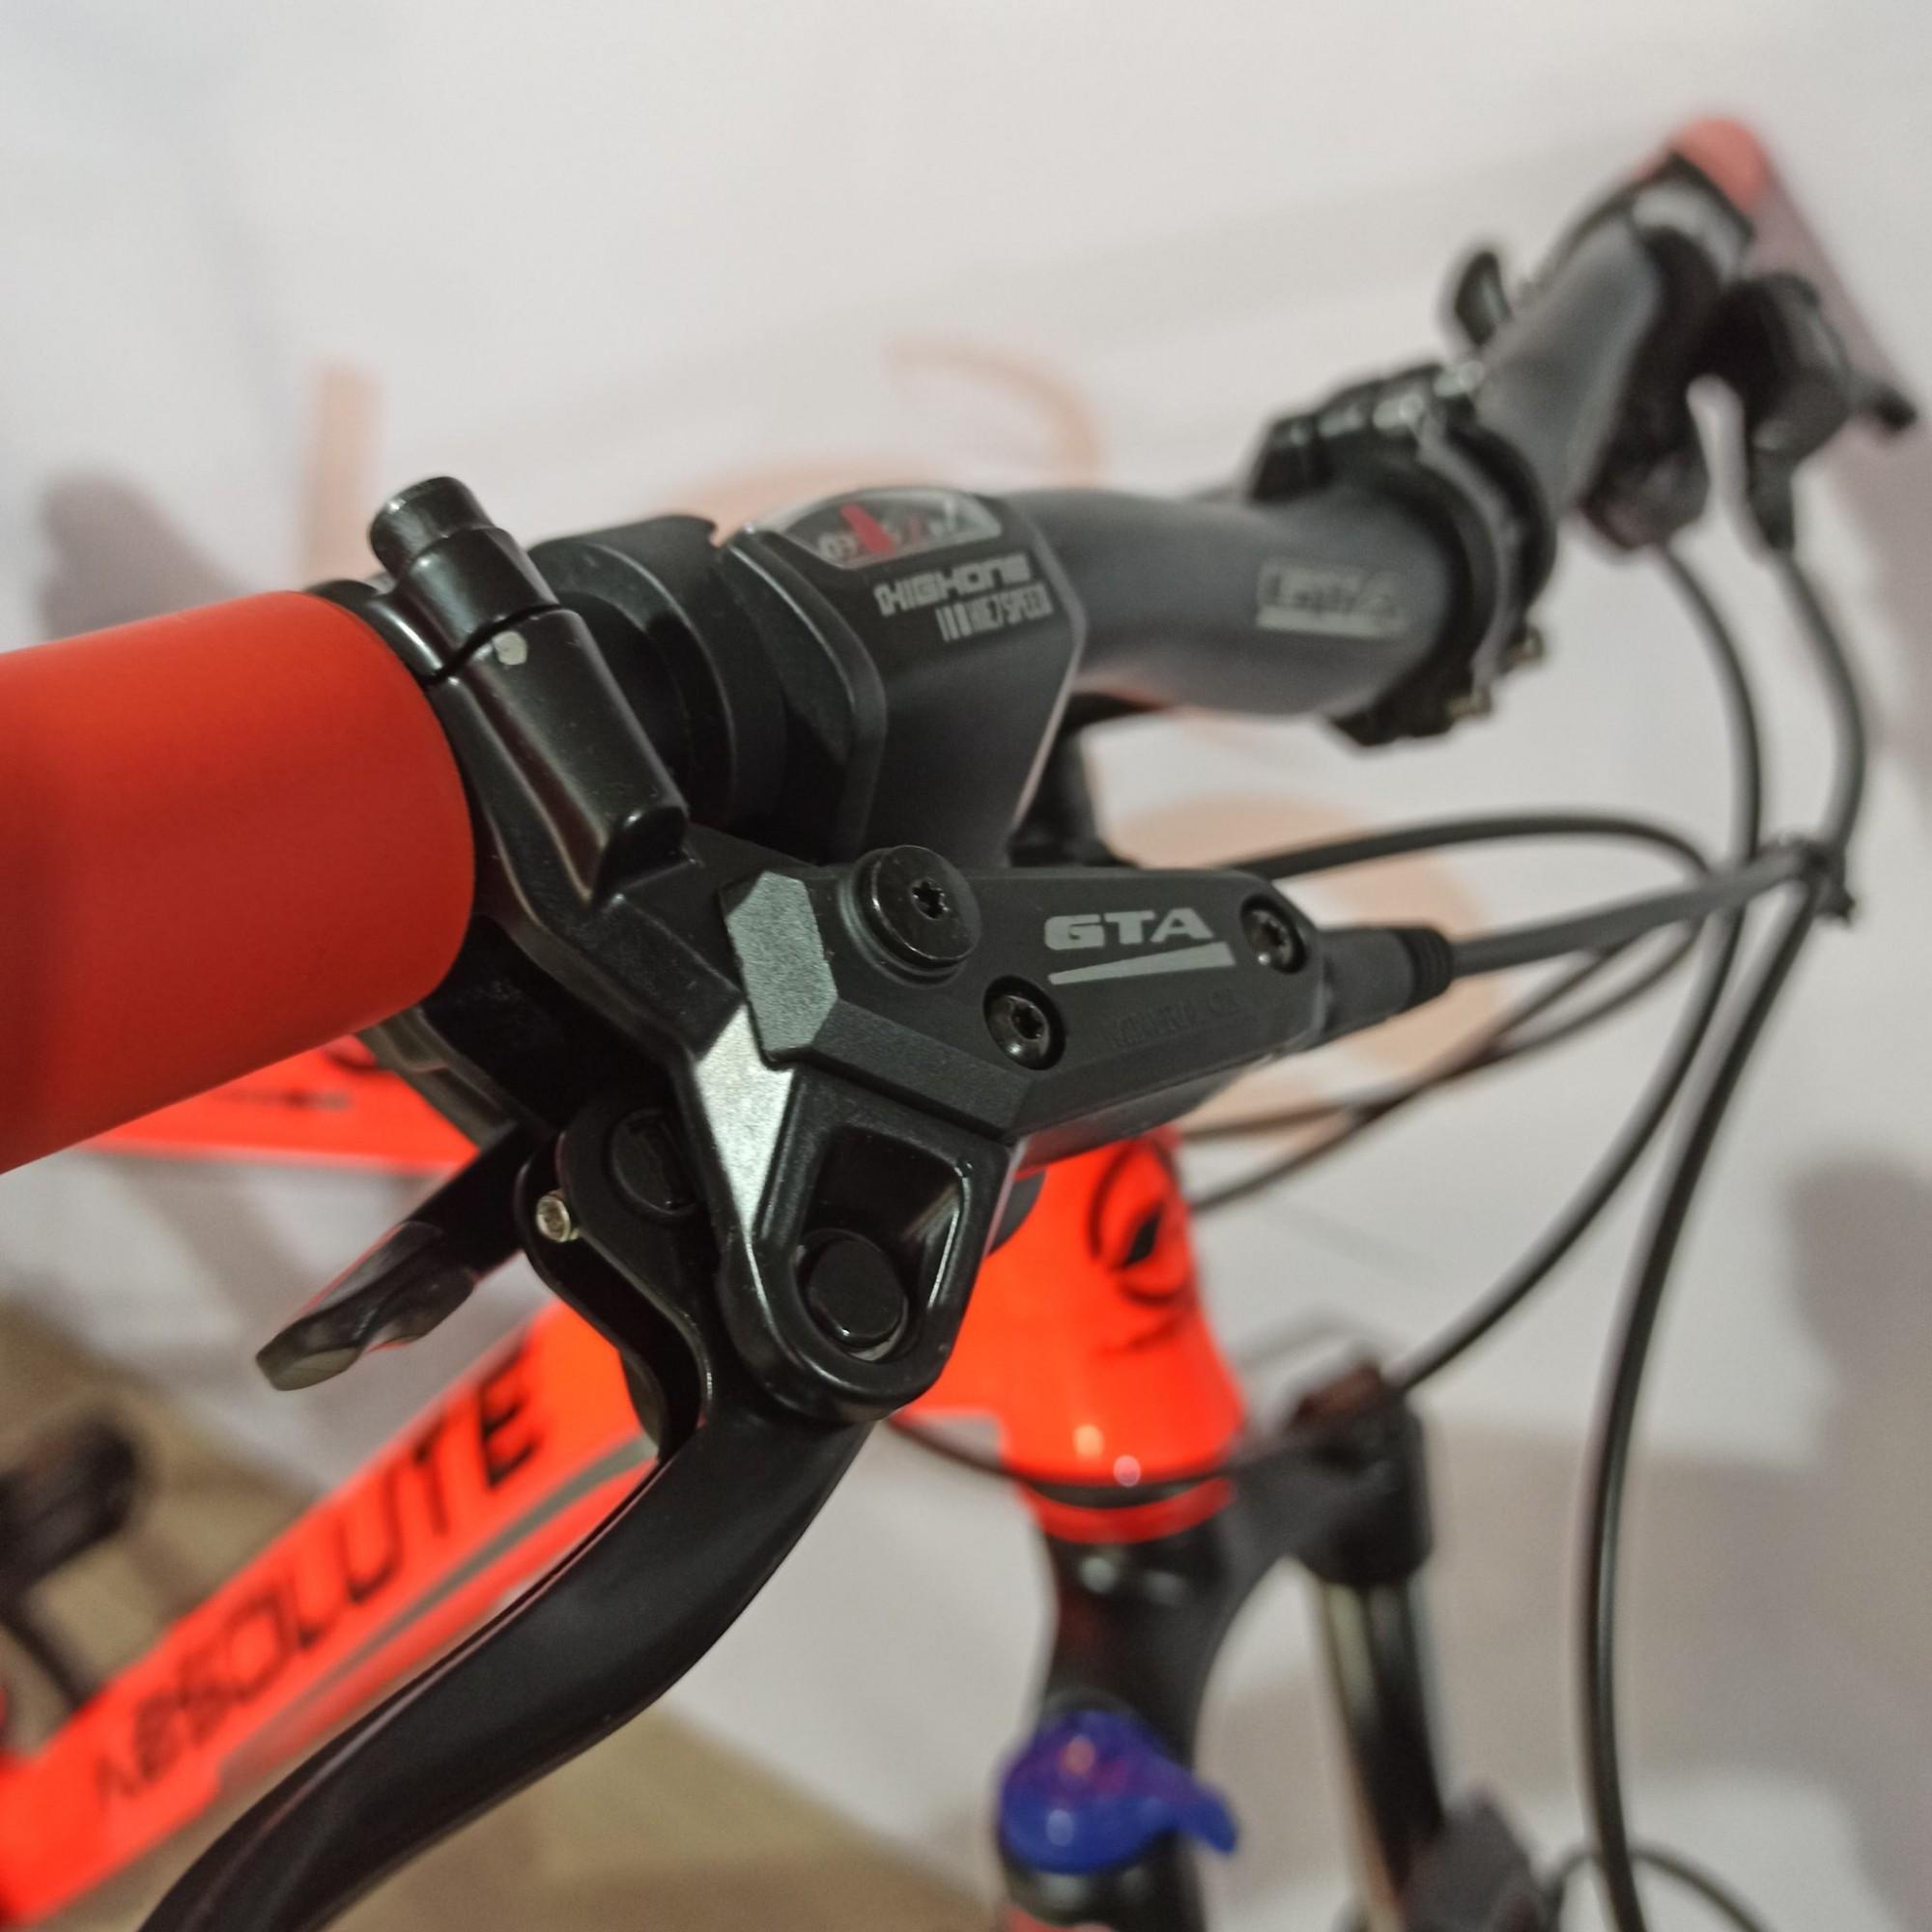 Bicicleta ABSOLUTE Nero aro 29 - 14v MicroShift - Freio GTA Hidráulico - Suspensão BikeMax c/ trava no ombro